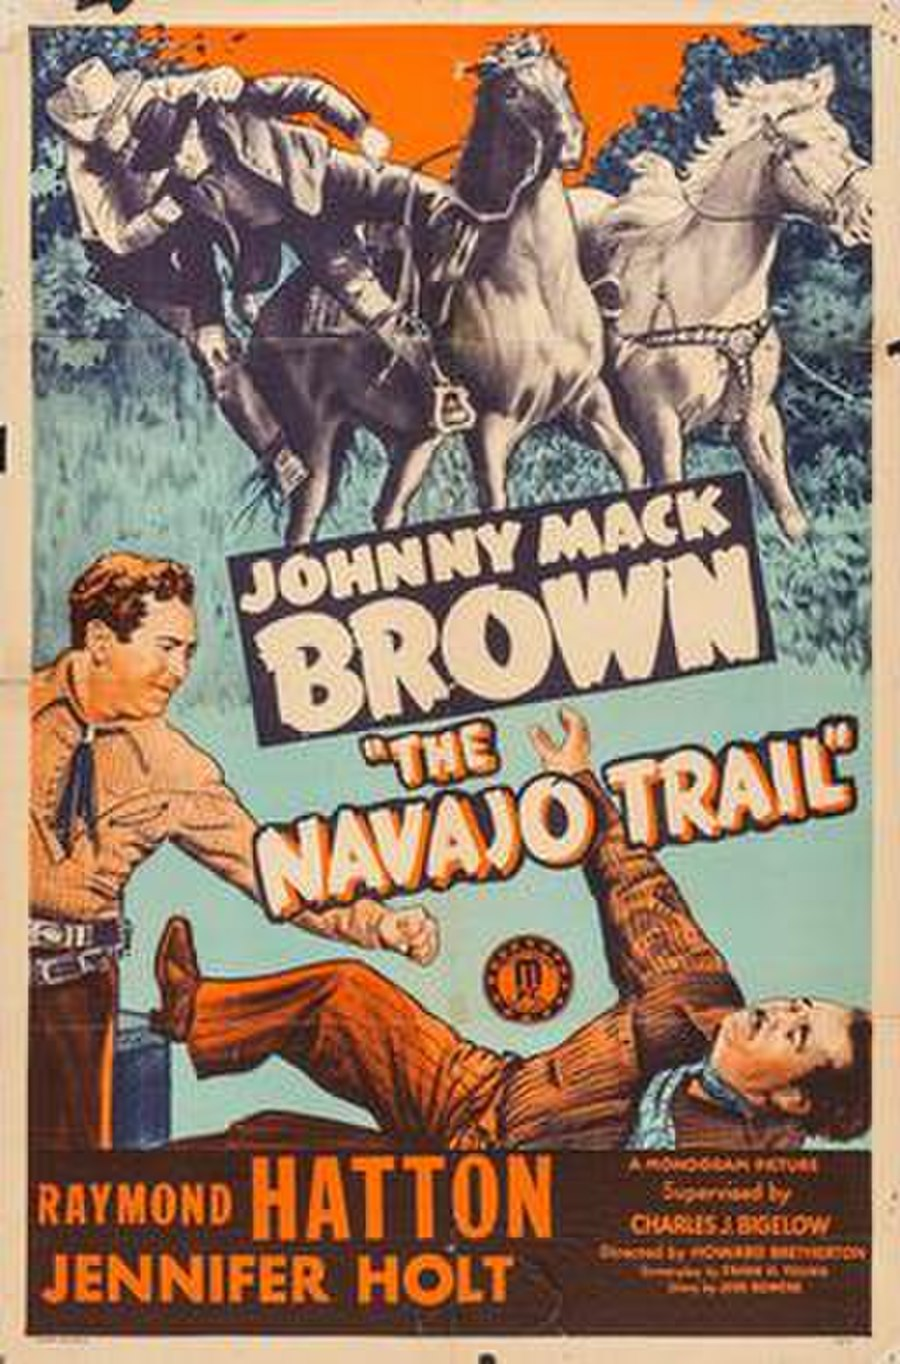 The Navajo Trail